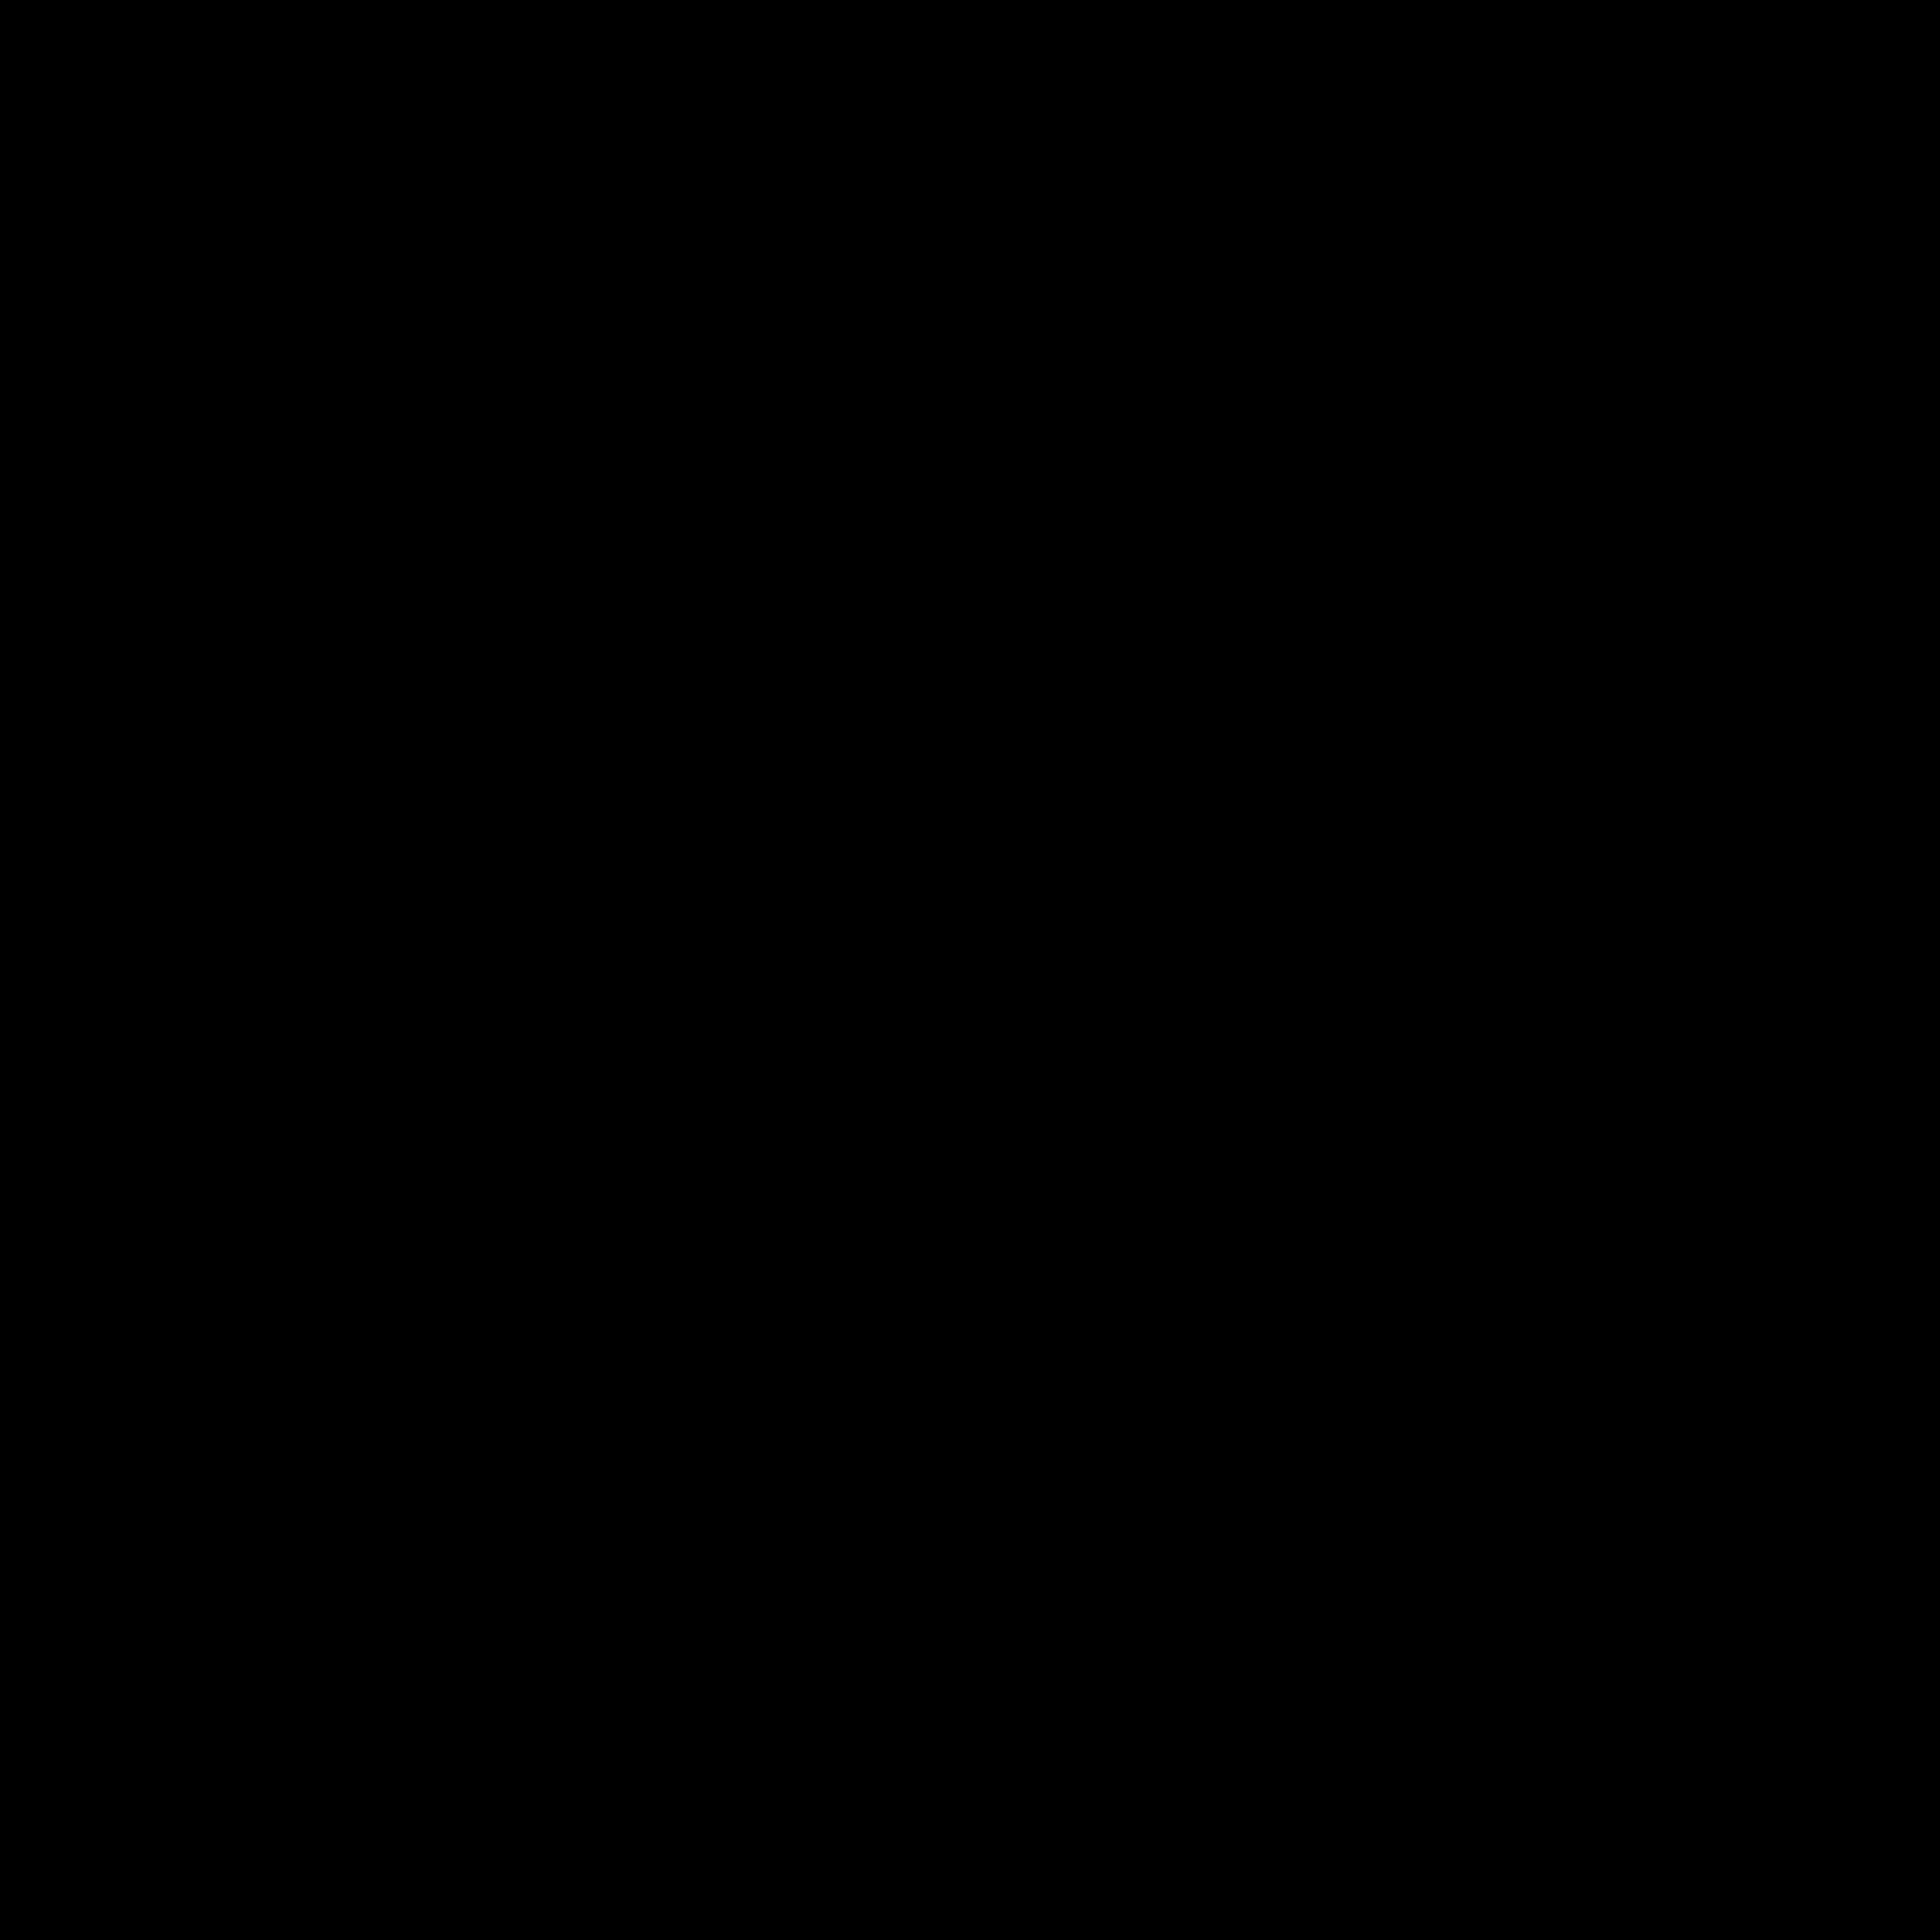 Dior Logo Wallpaper In 2021 Hypebeast Wallpaper Iphone Wallpaper Vintage Hypebeast Iphone Wallpaper